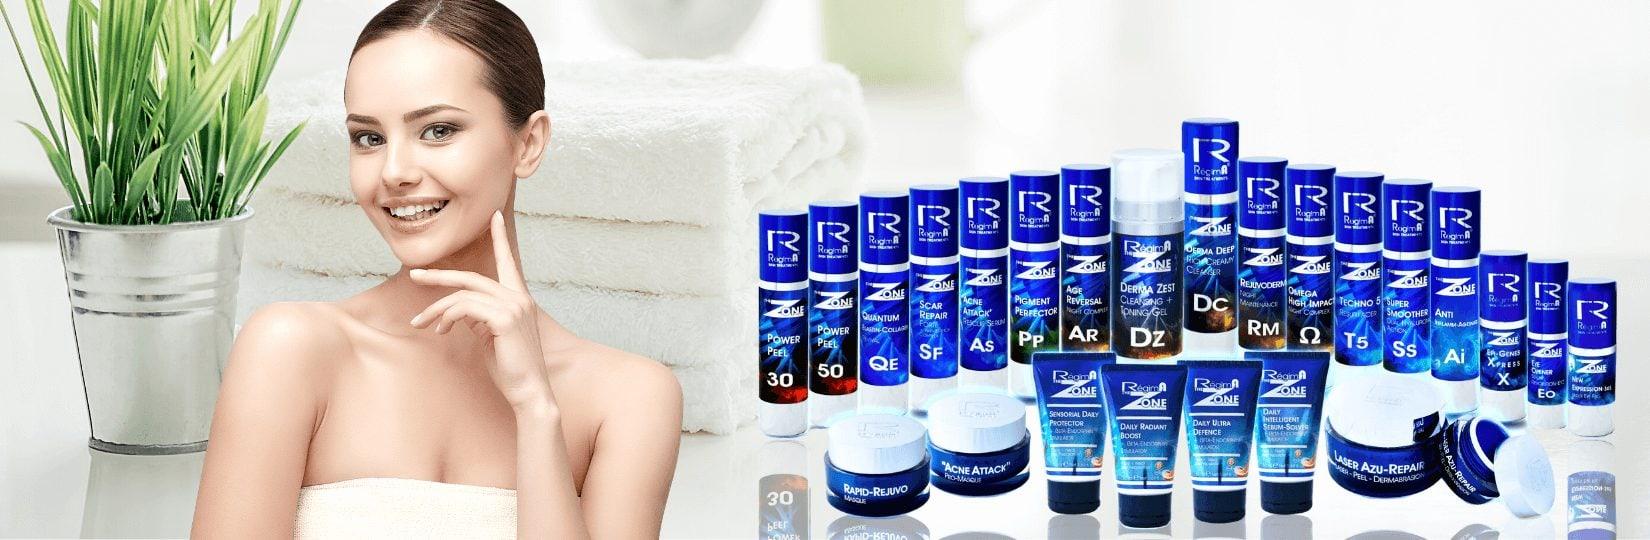 RegimaA product range